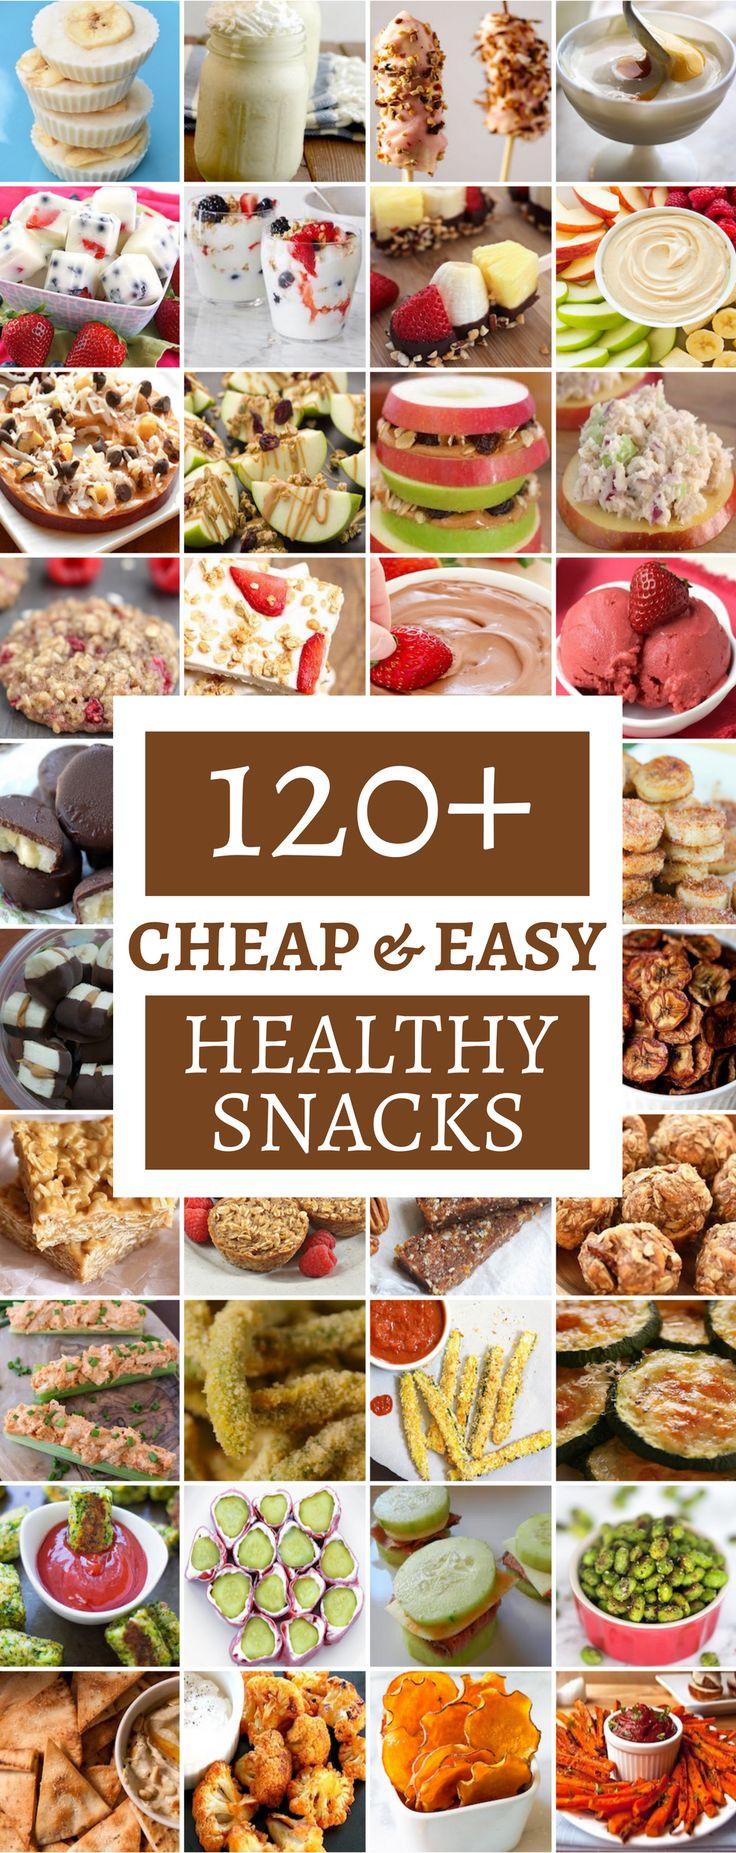 Cheap Easy Healthy Snacks  Best 25 Cheap healthy snacks ideas on Pinterest